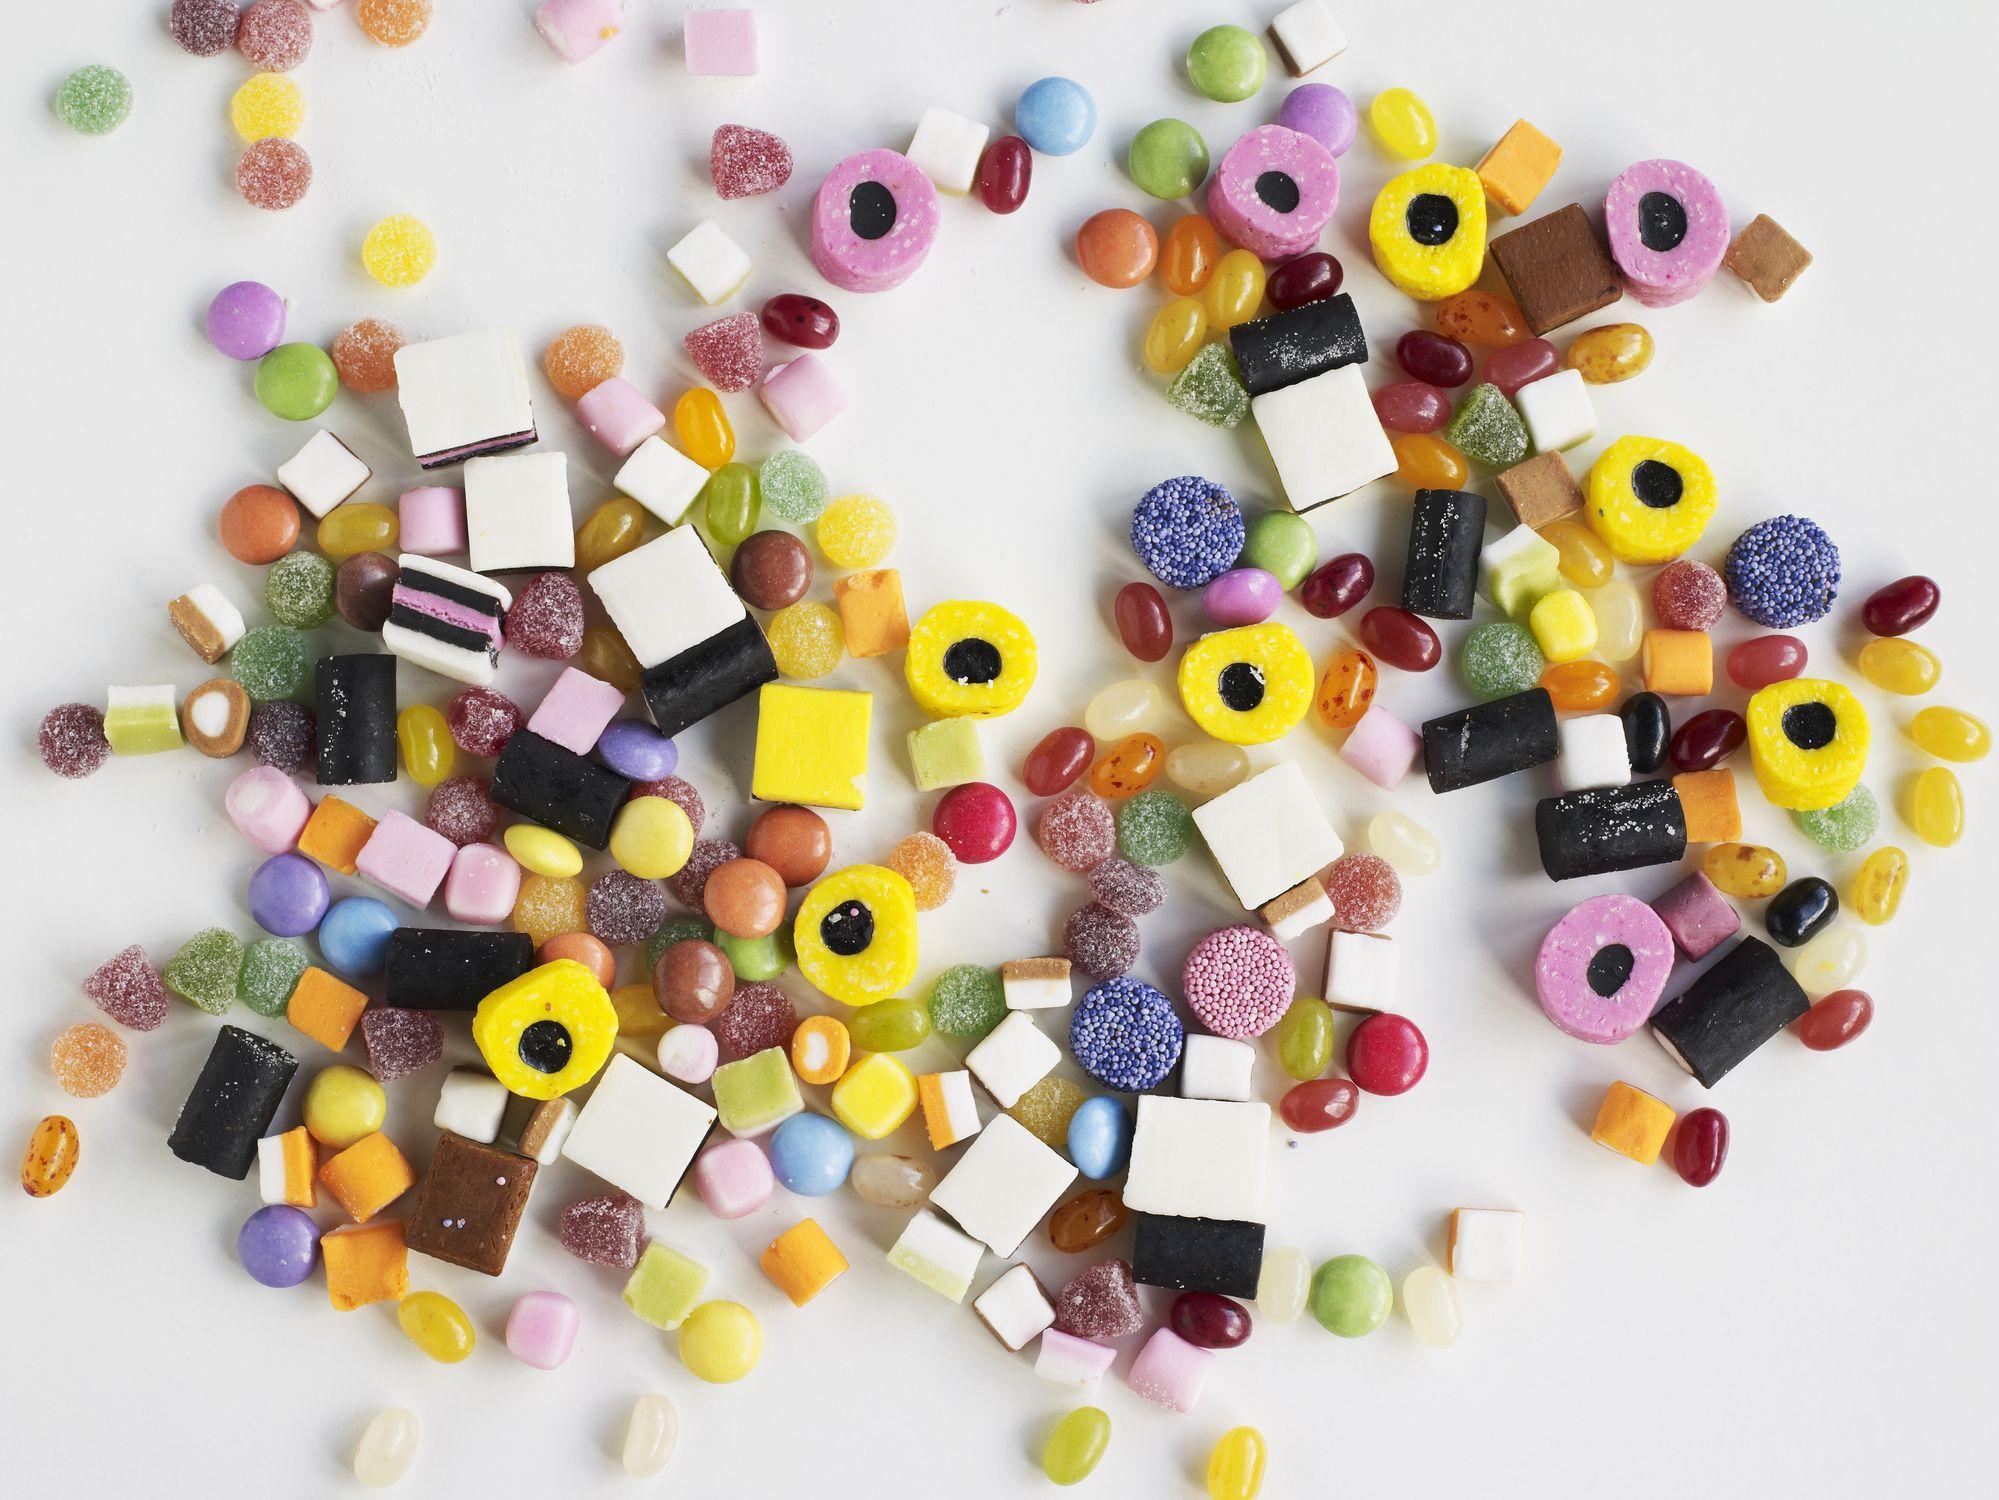 liquorice allsorts, sweets